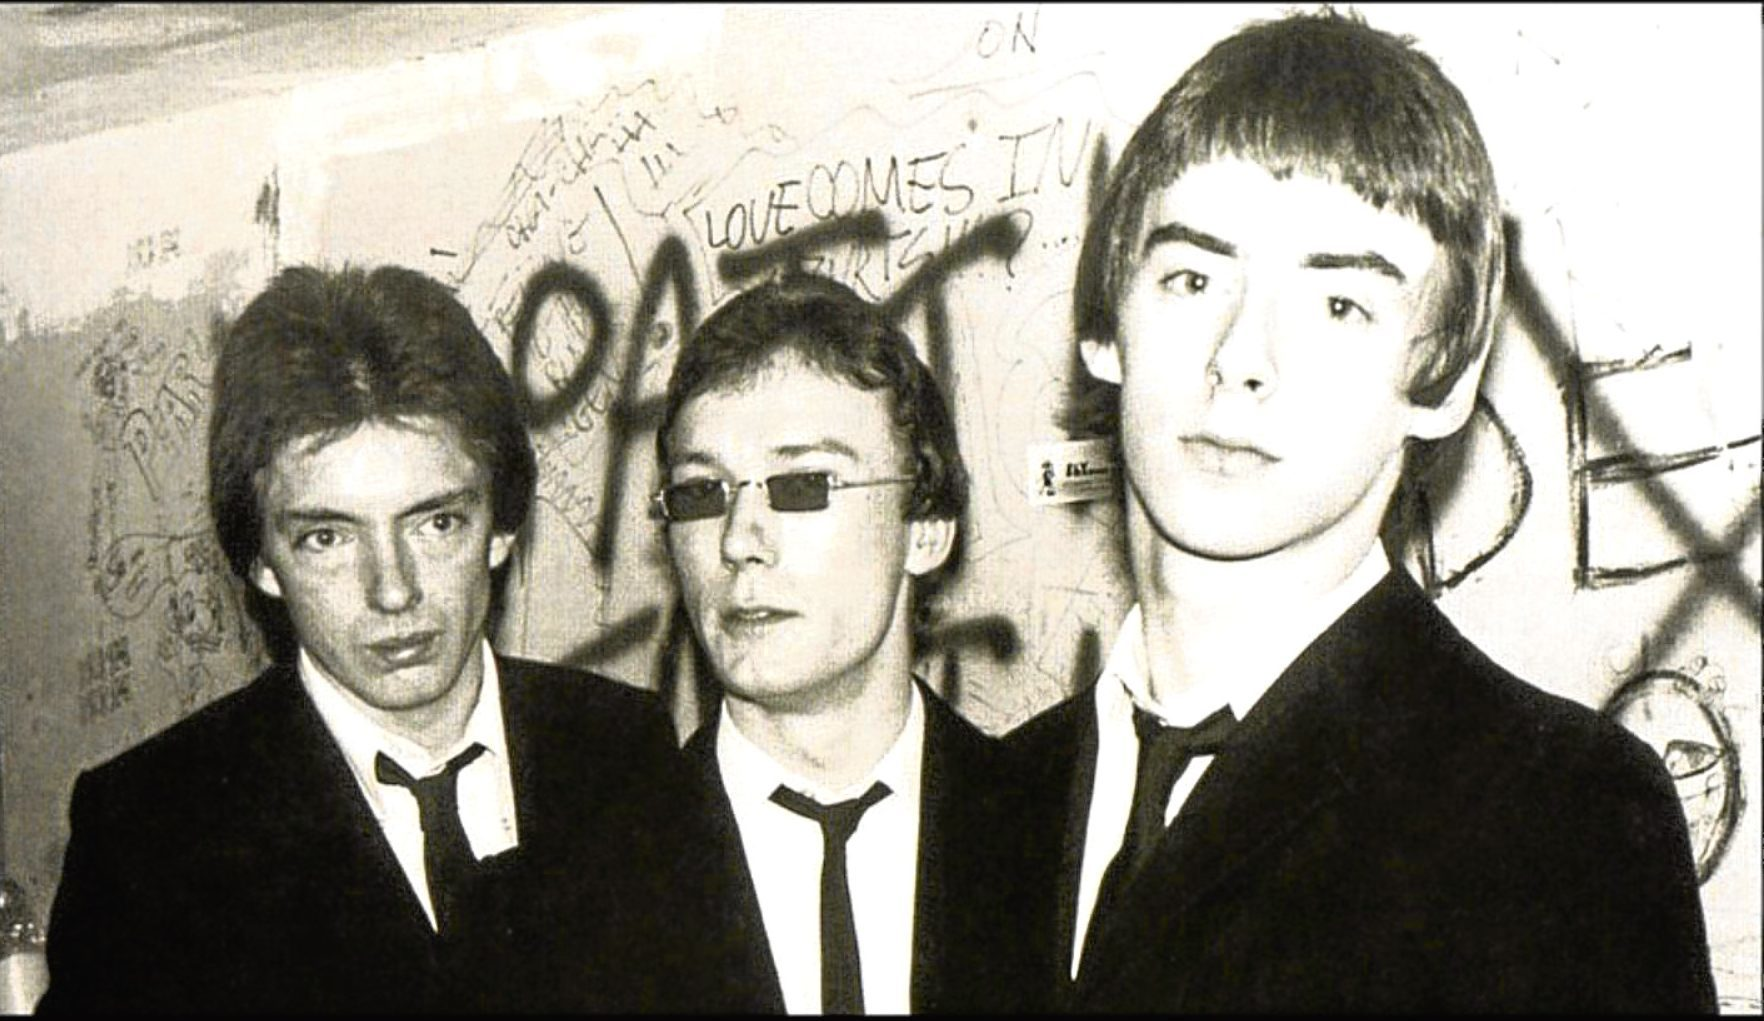 Paul Weller and The Jam